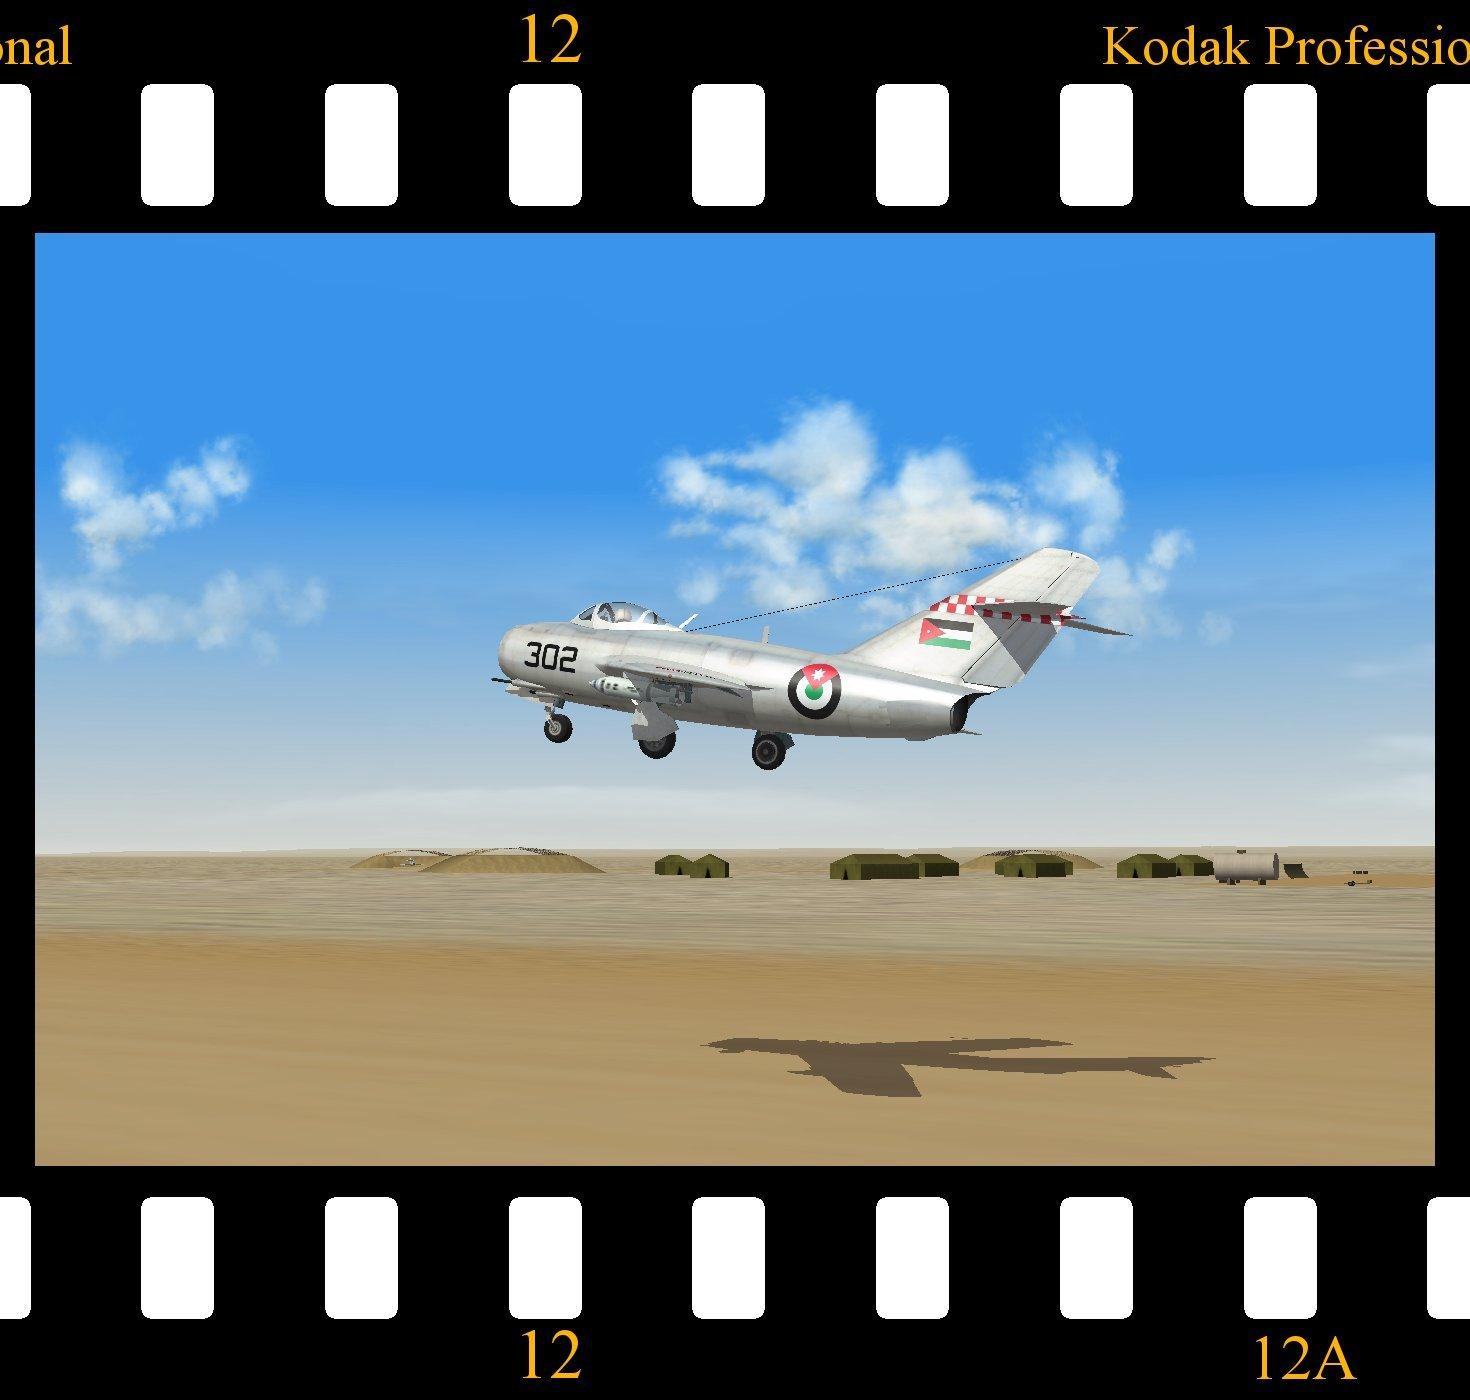 Mikoyan-Gurevich MiG-15bis - RJAF